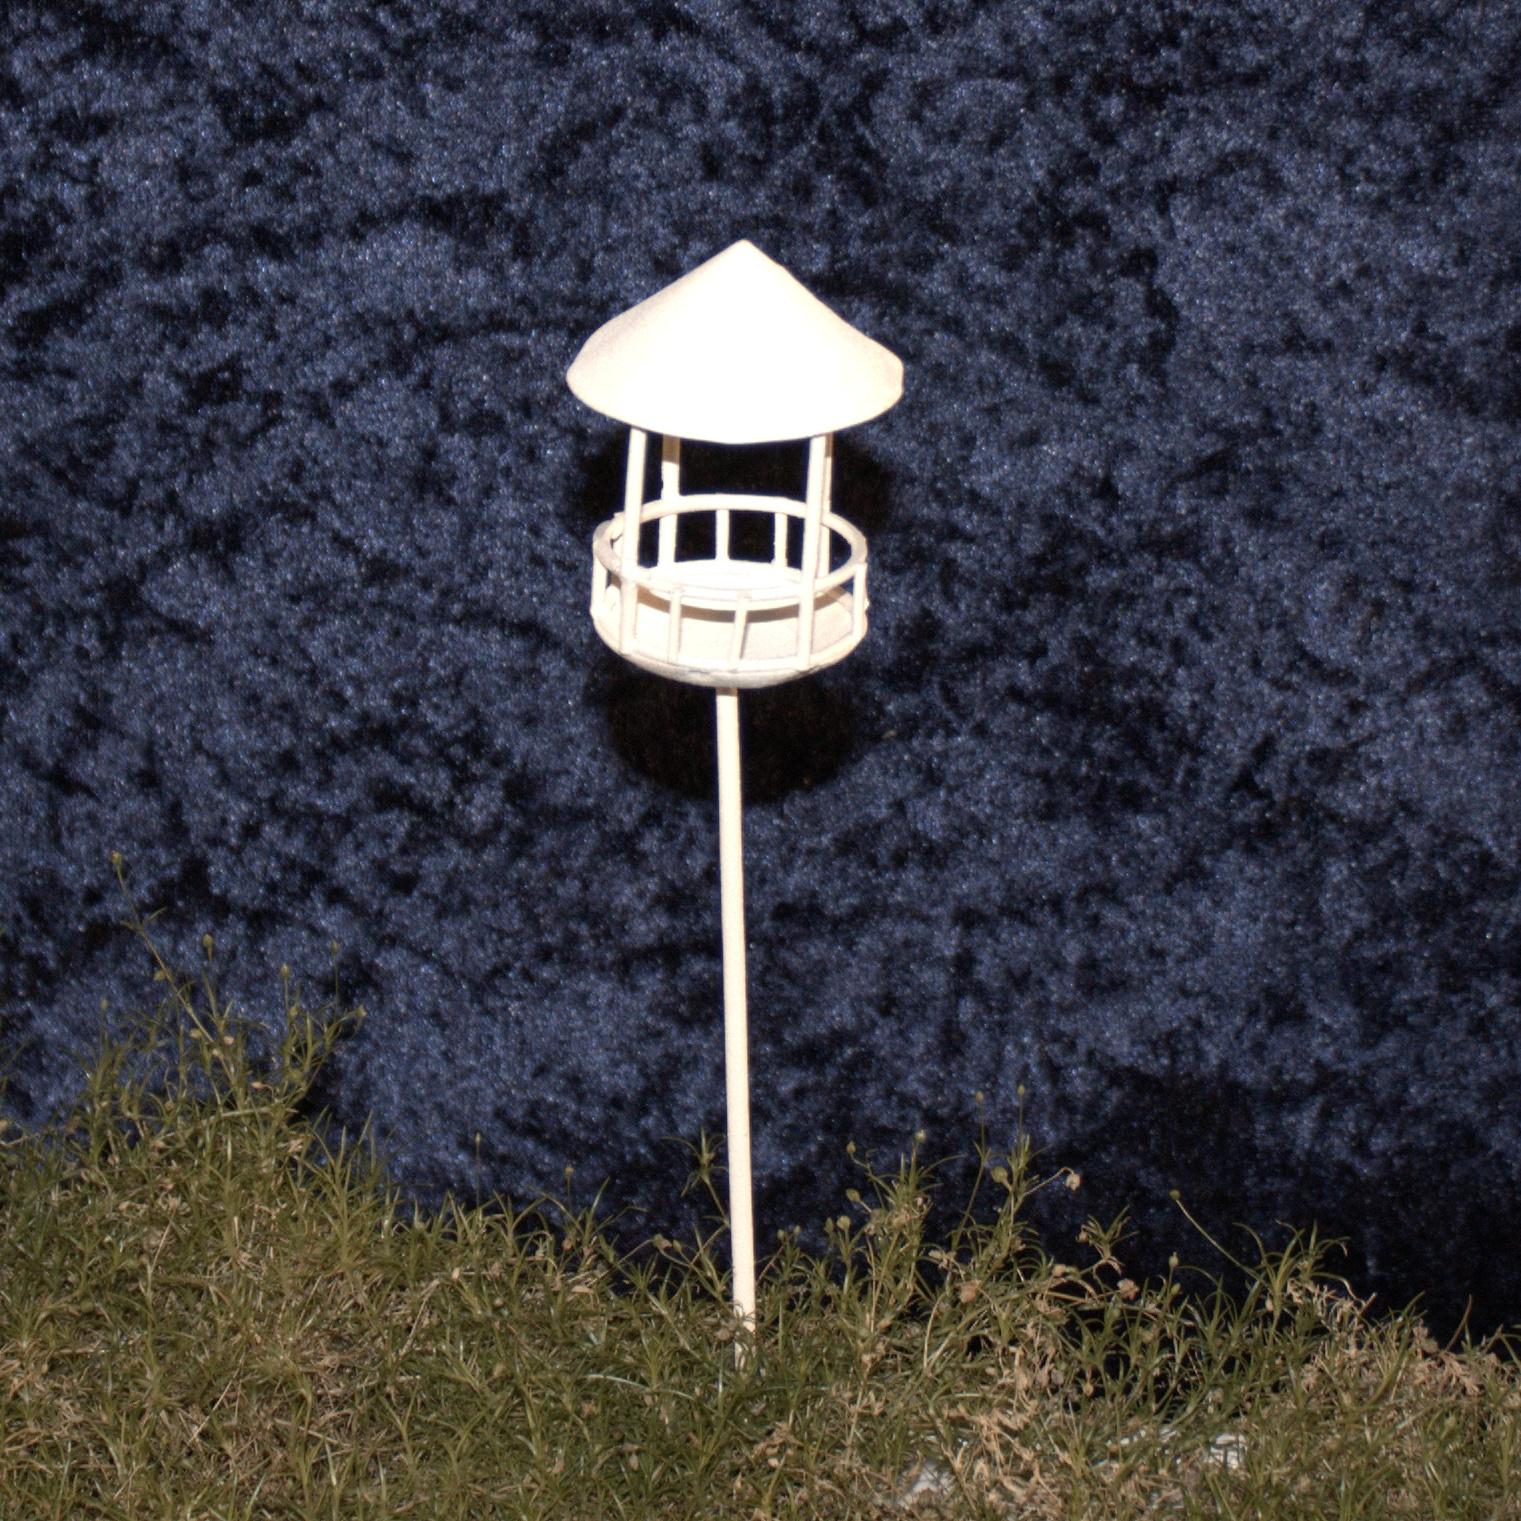 Minigarten taubenschlag wei vogel gartendeko miniatur - Miniatur gartenmobel ...